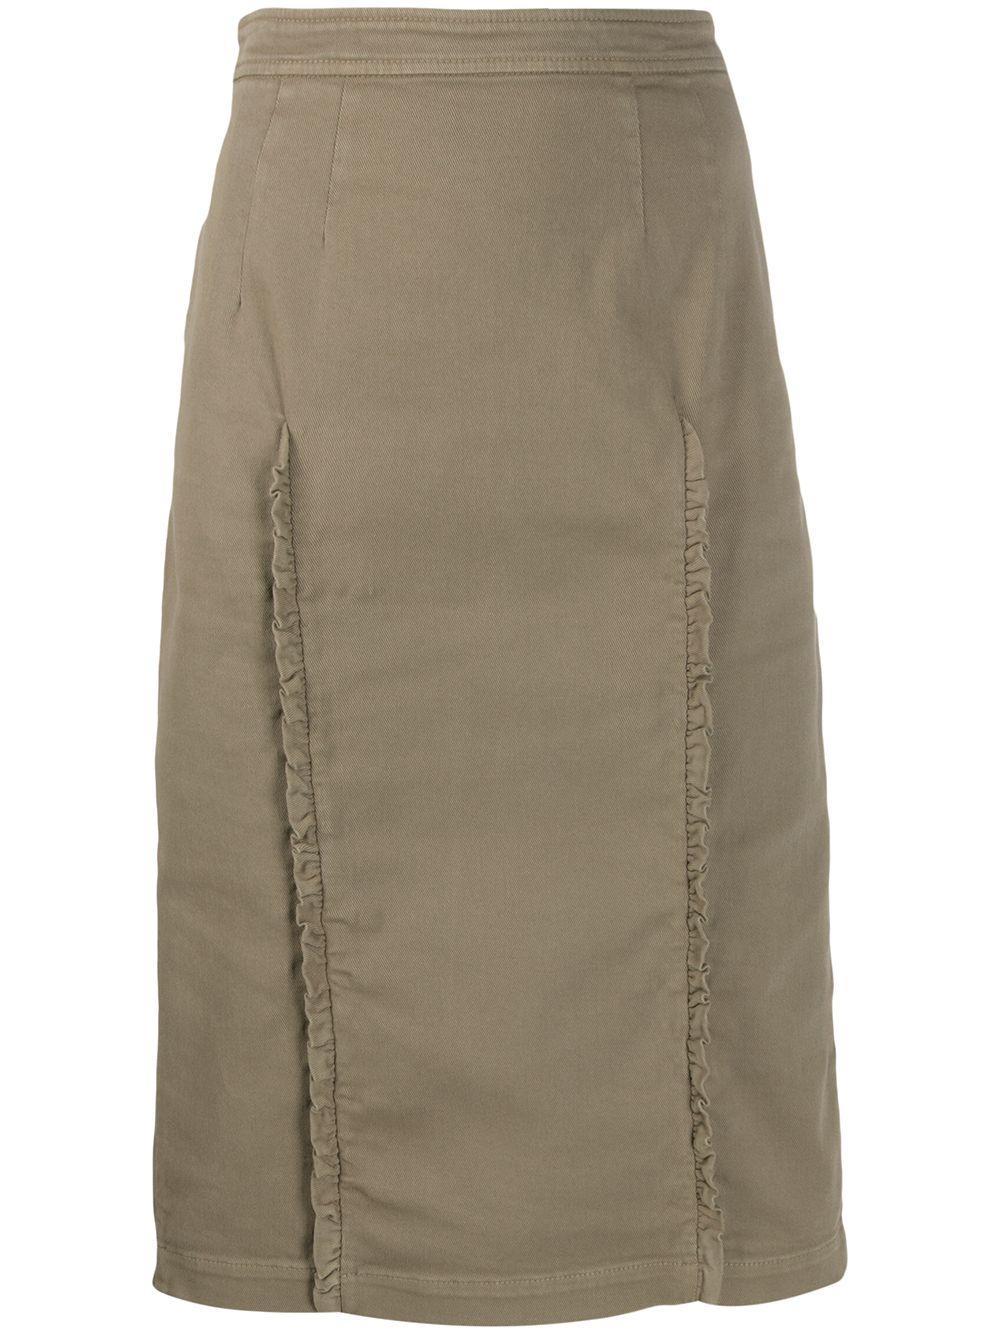 Nº21 джинсовая юбка-карандаш с оборками